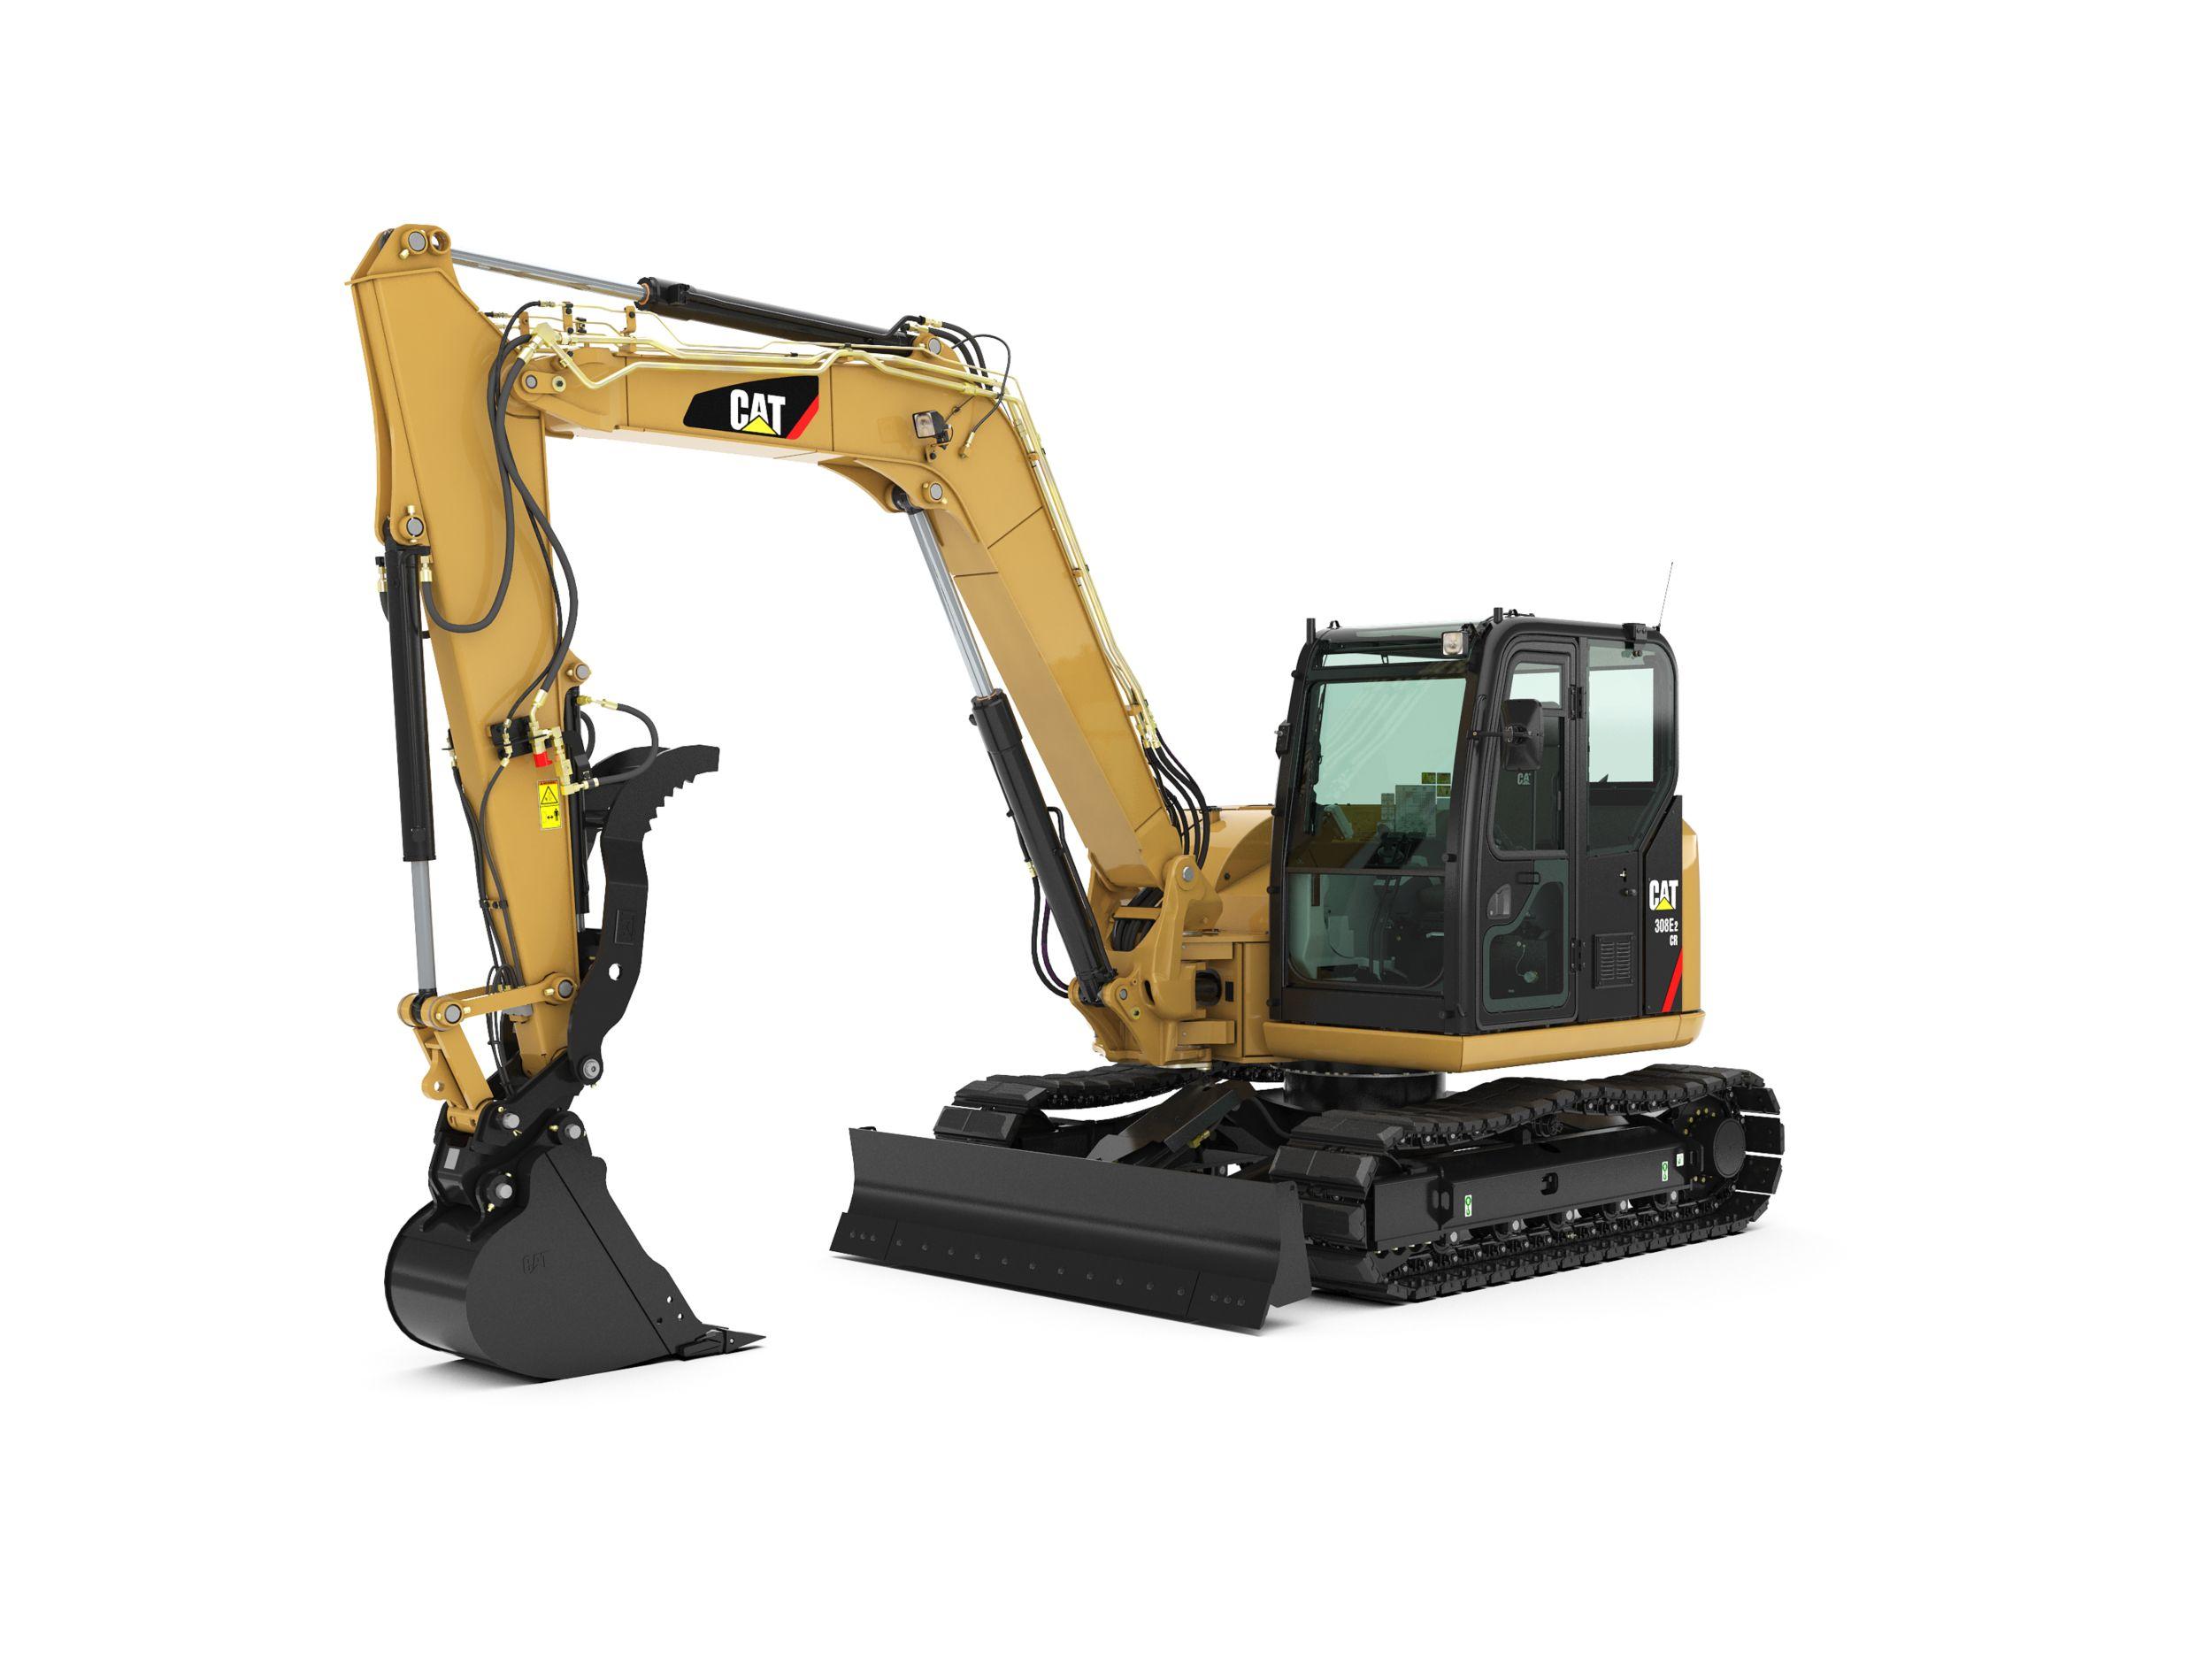 308E2 CR Mini Hydraulic Excavator with Swing Boom